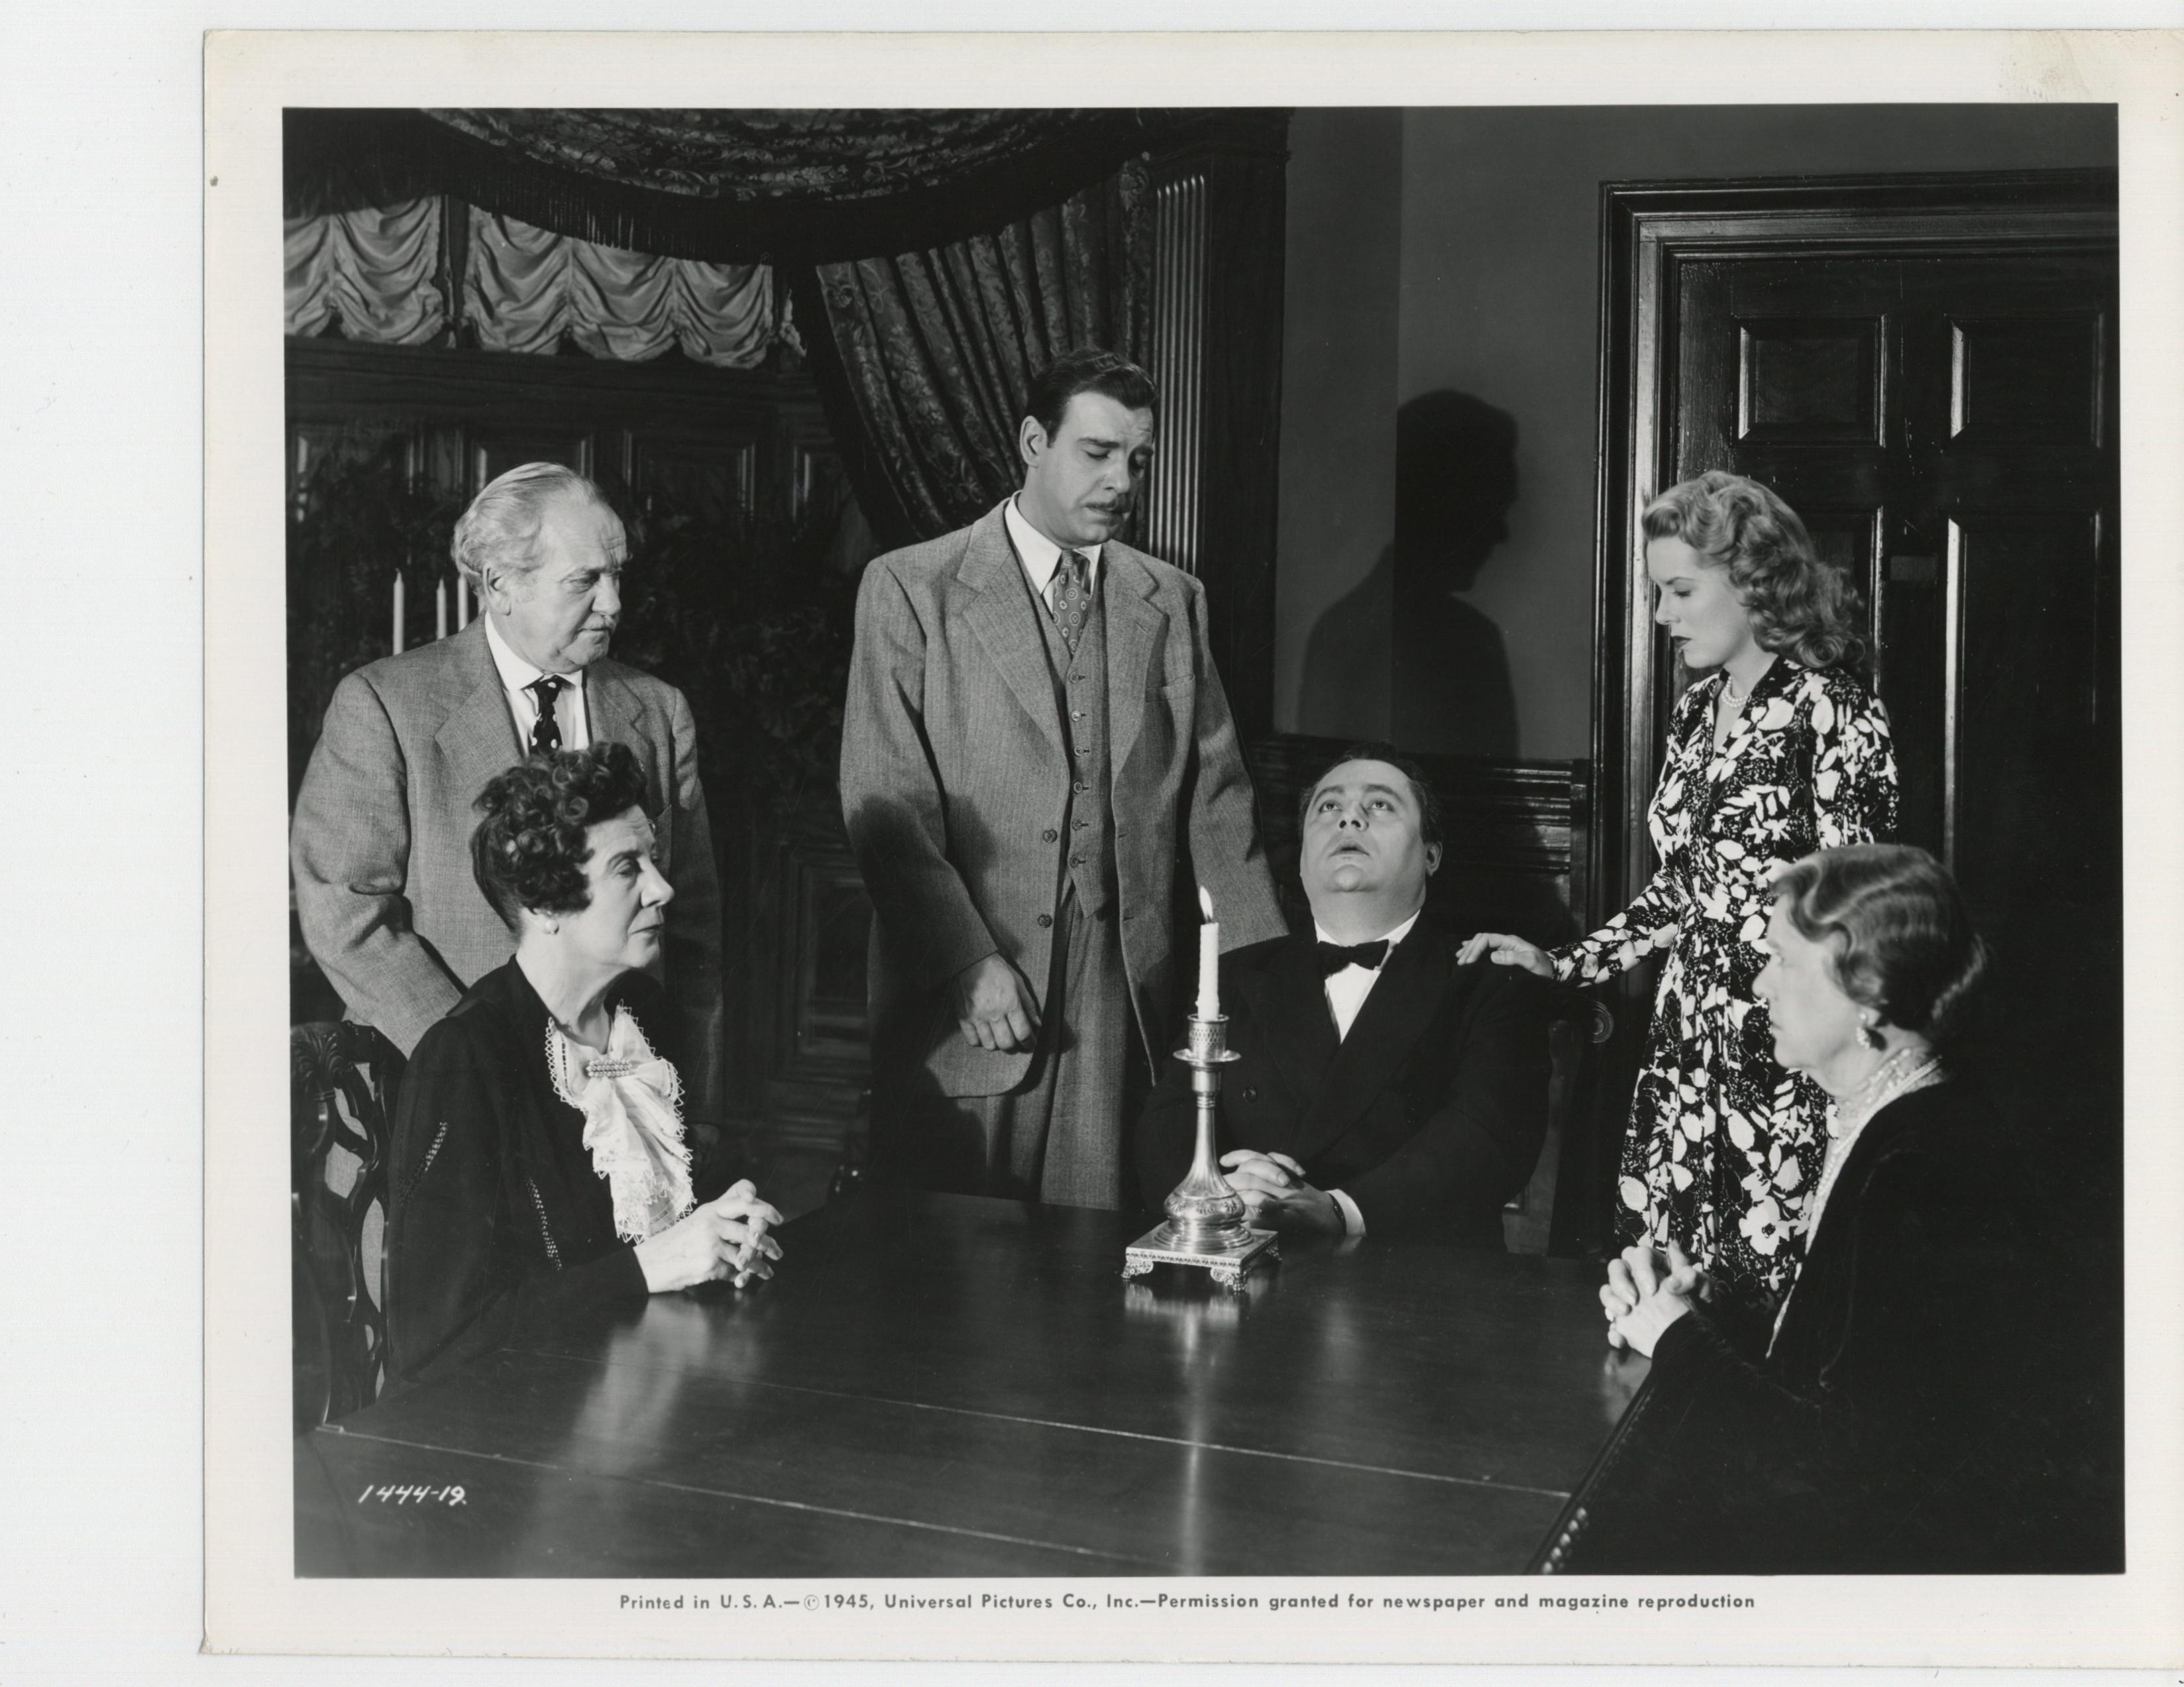 Lon Chaney Jr., Clara Blandick, J. Edward Bromberg, George Cleveland, Rosalind Ivan, and Brenda Joyce in Pillow of Death (1945)